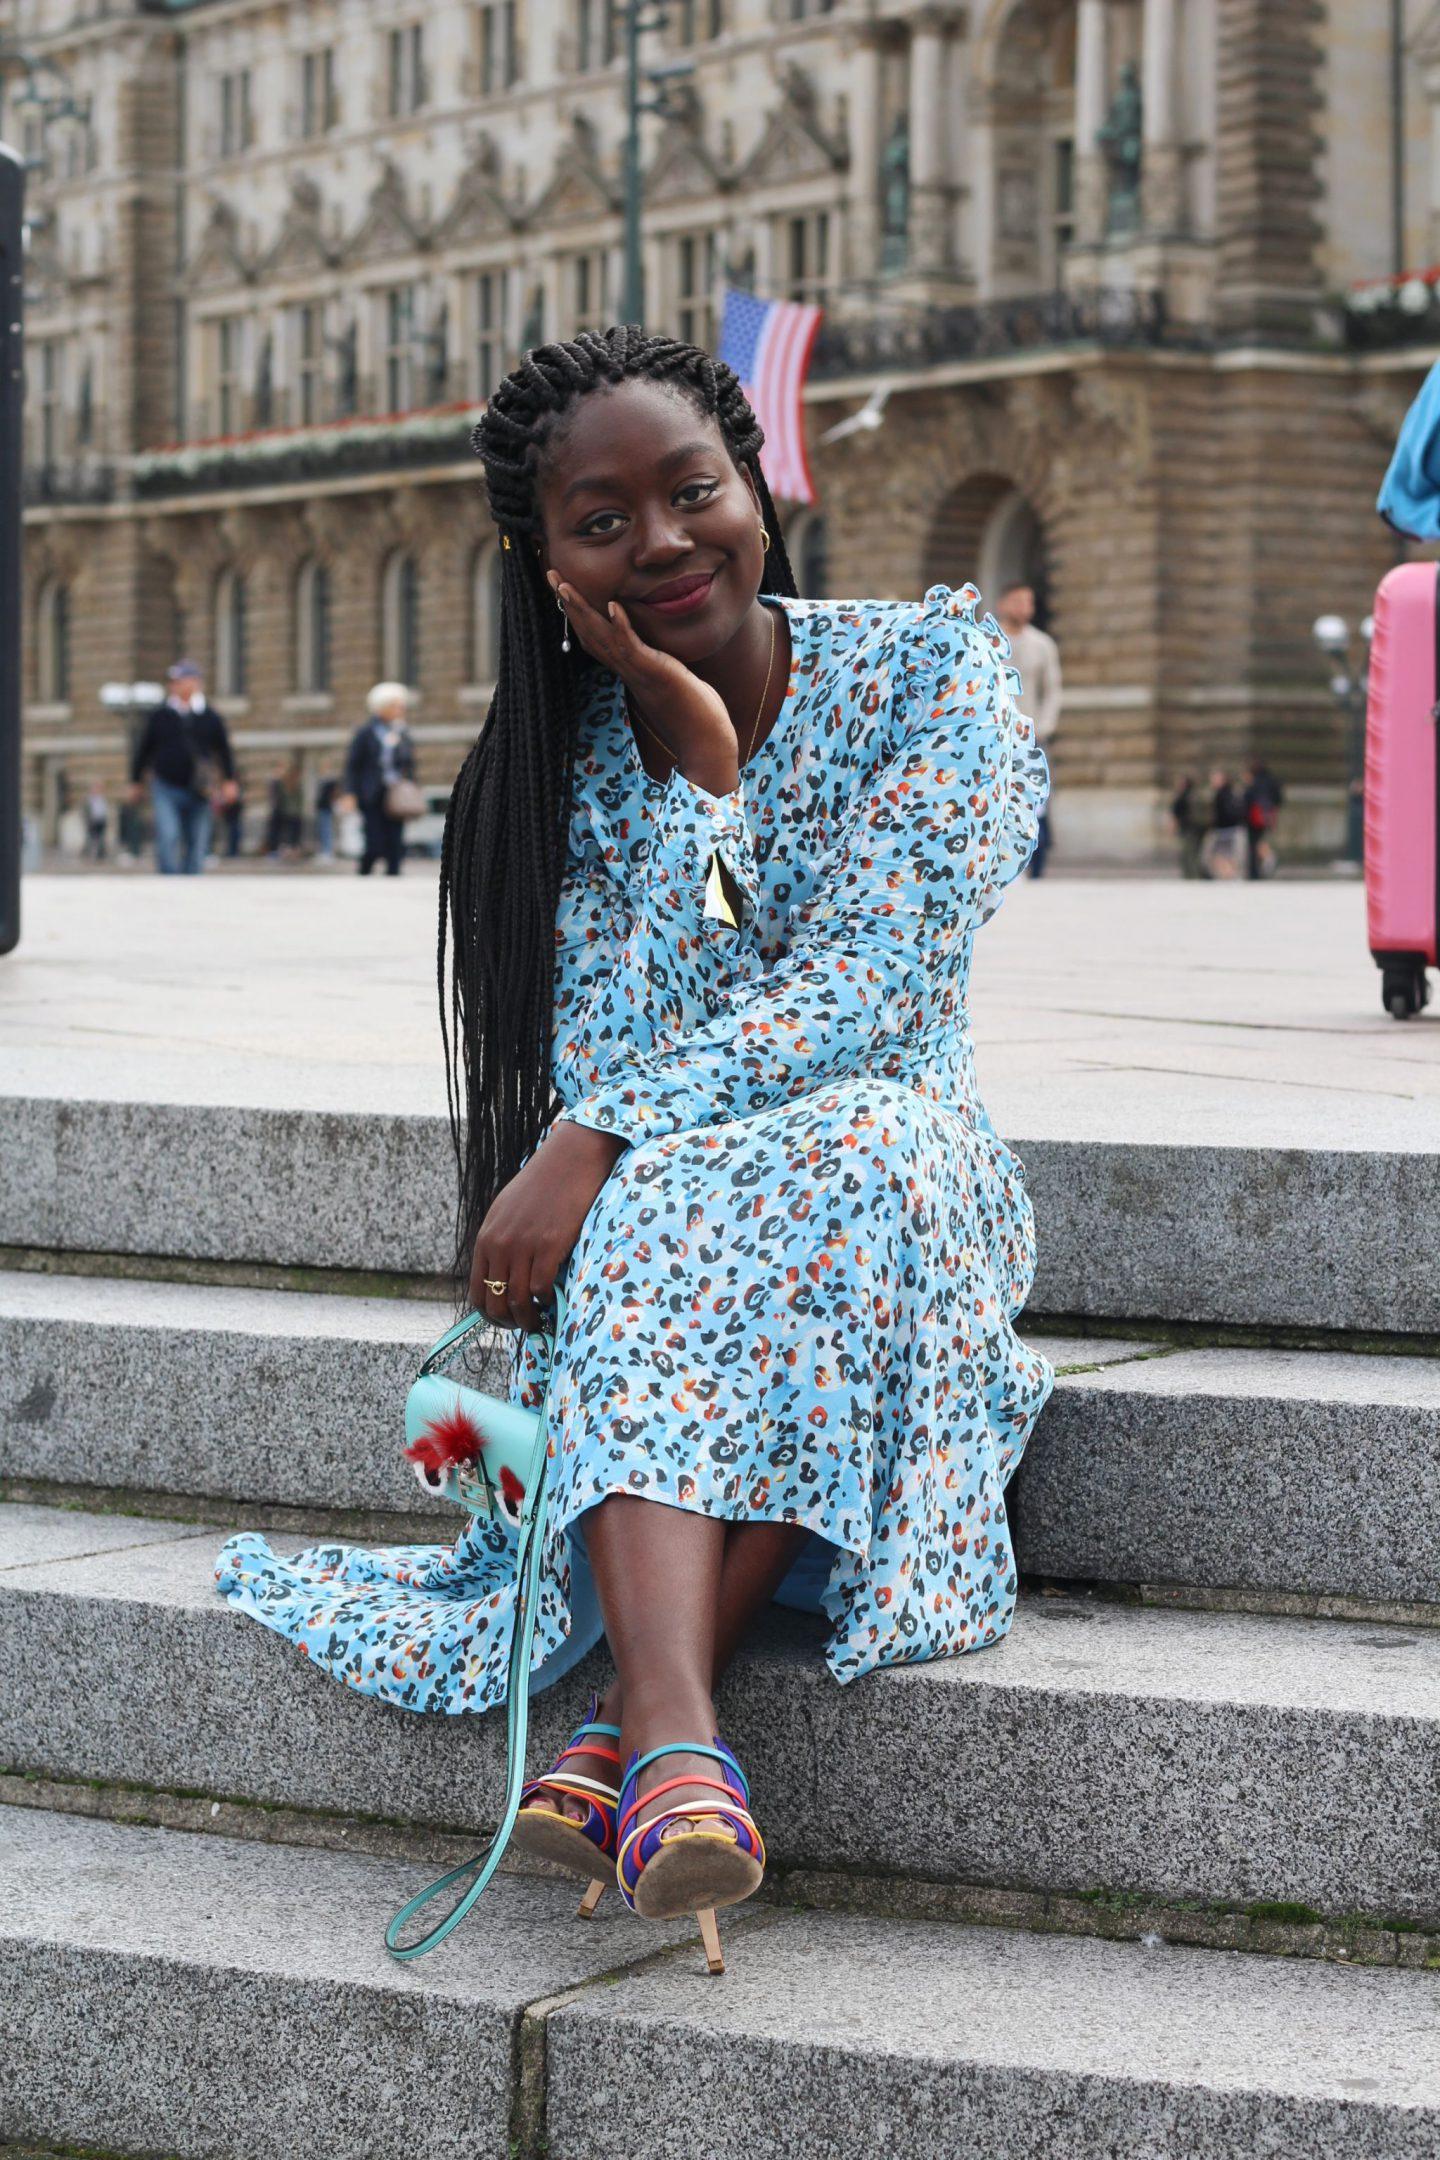 Lala_Berlin_Streetstyle_Lois_Opoku_Fashion_Blogger_Fendi_Monster_Malone_Souliers_lisforlois_10